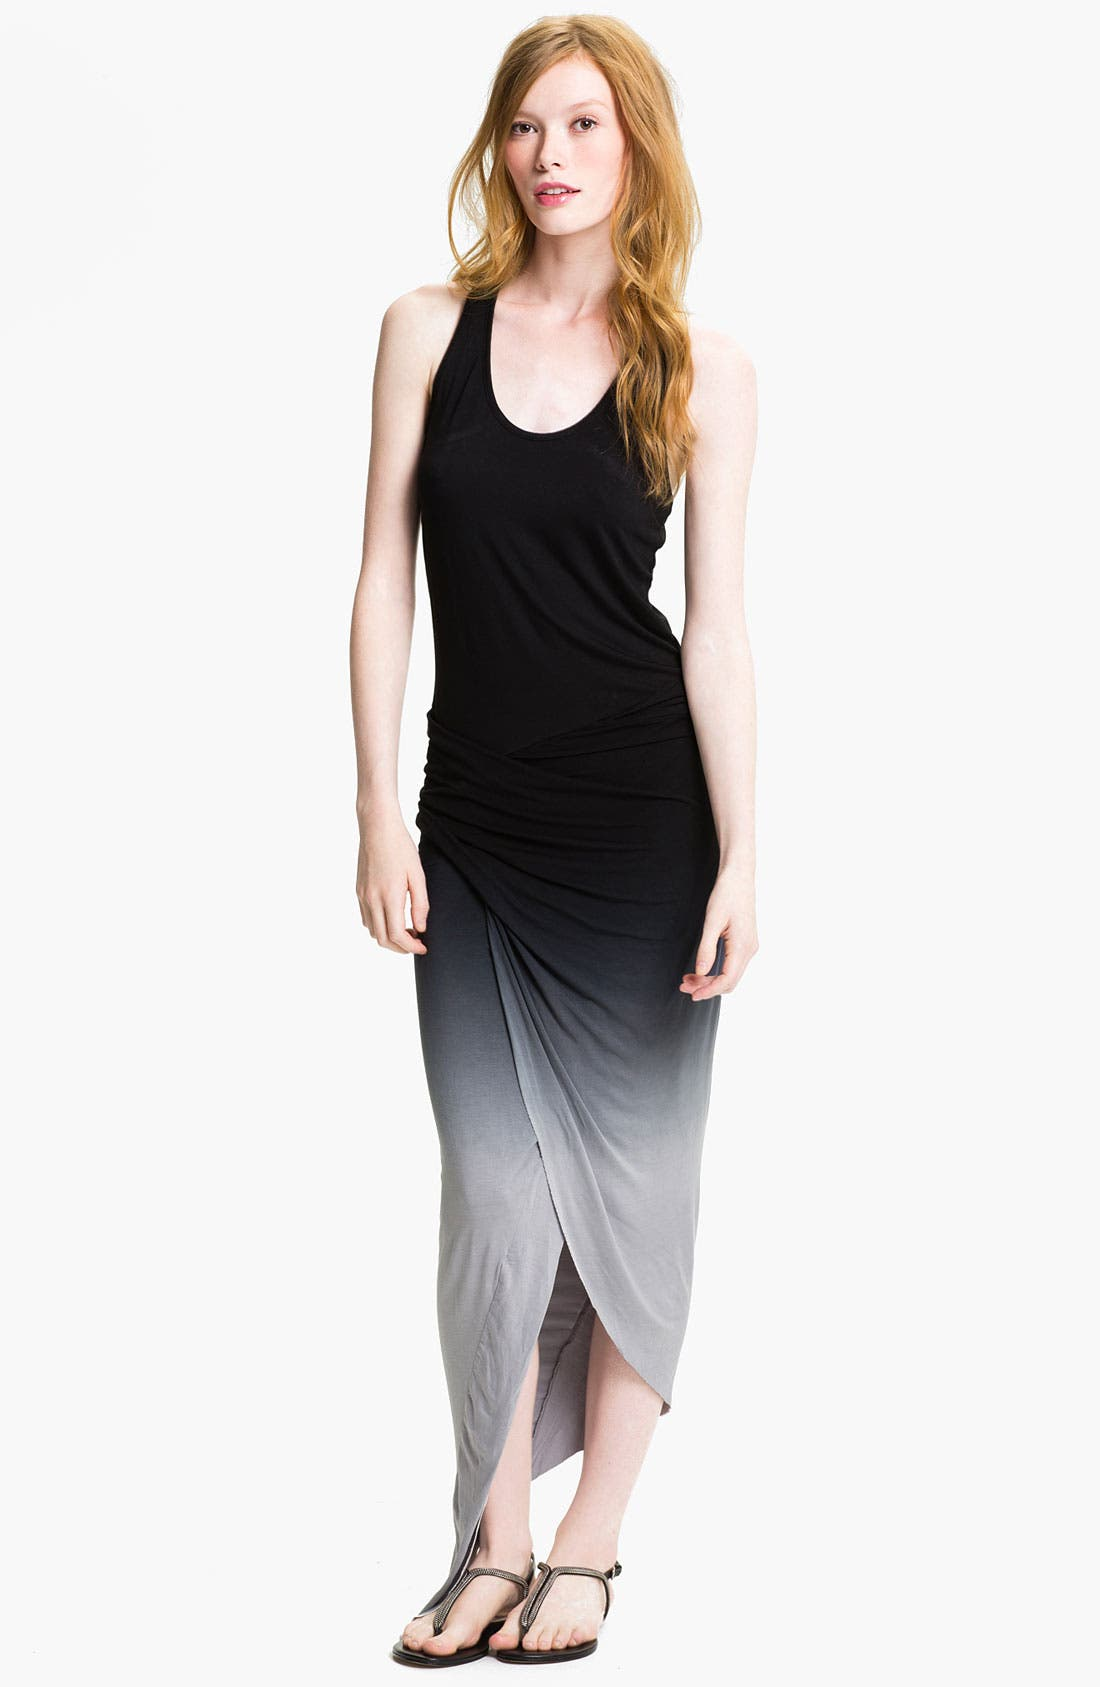 Alternate Image 1 Selected - Young, Fabulous & Broke 'Sassy' Faux Wrap Maxi Dress